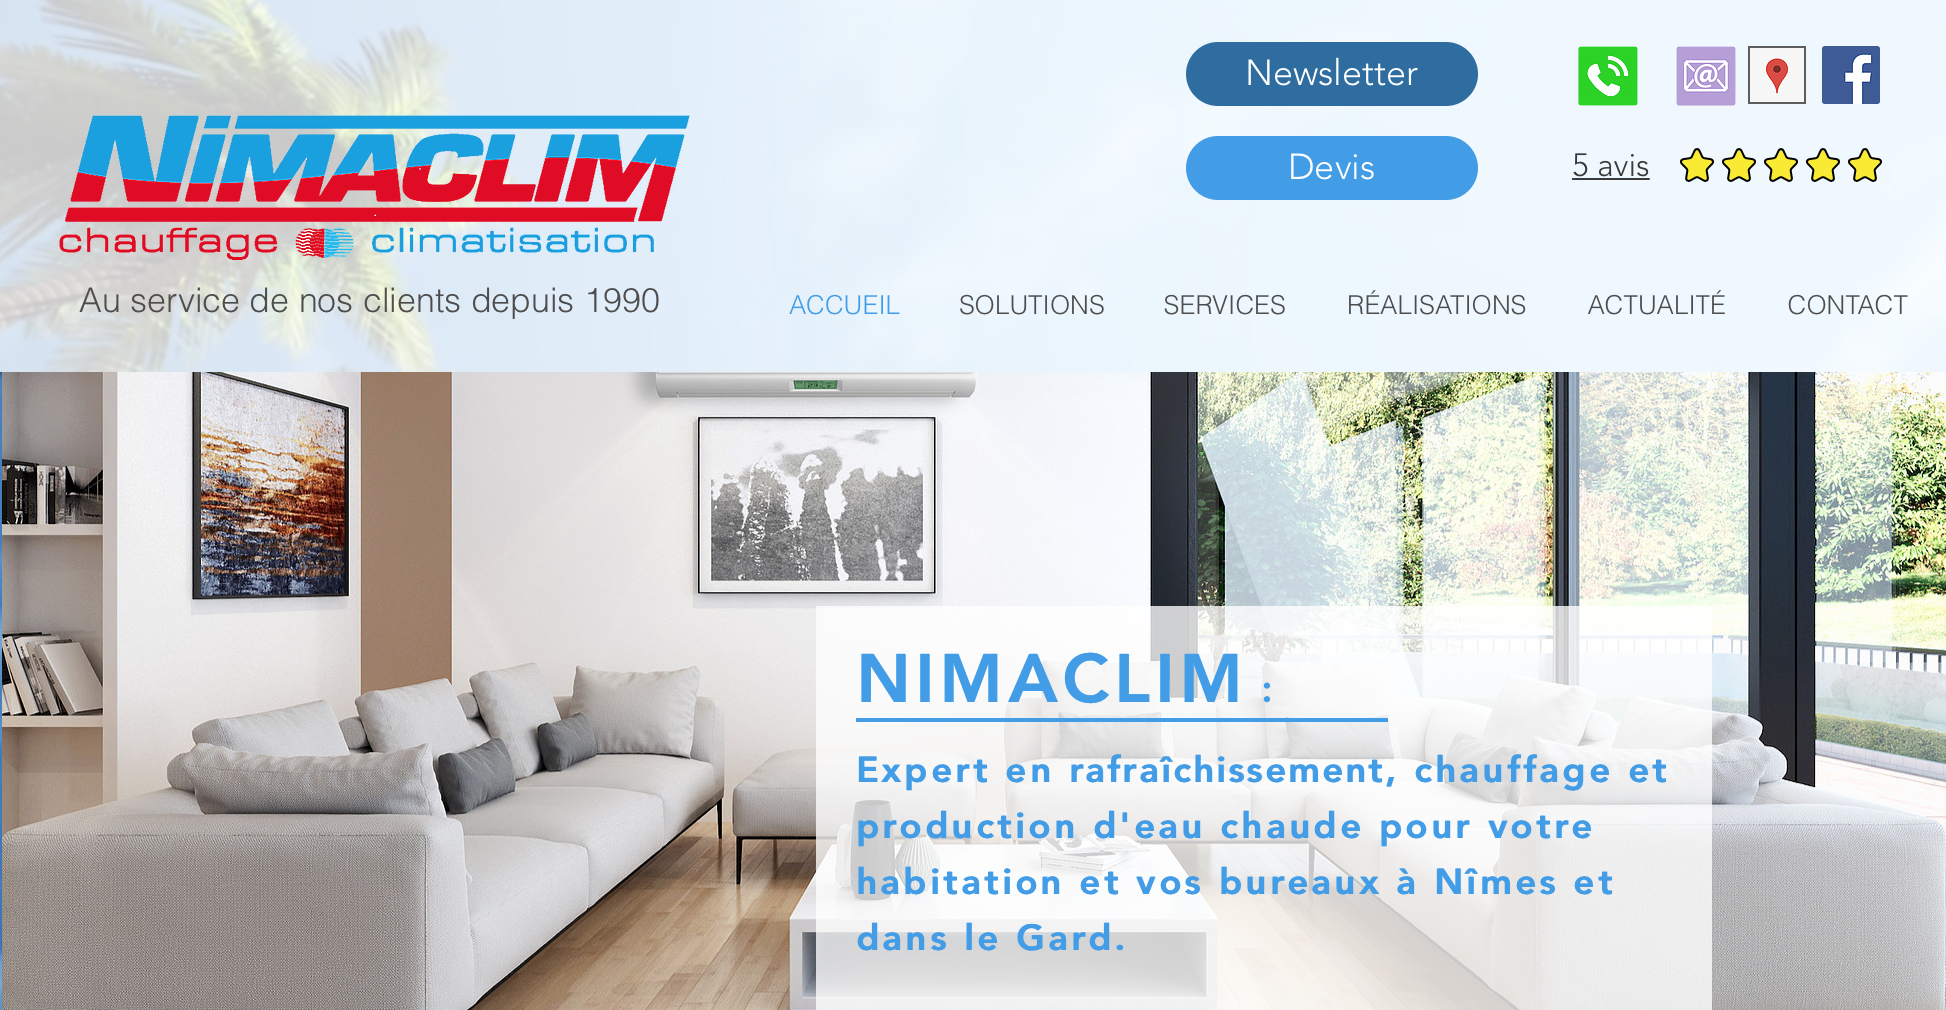 NIMACLIM